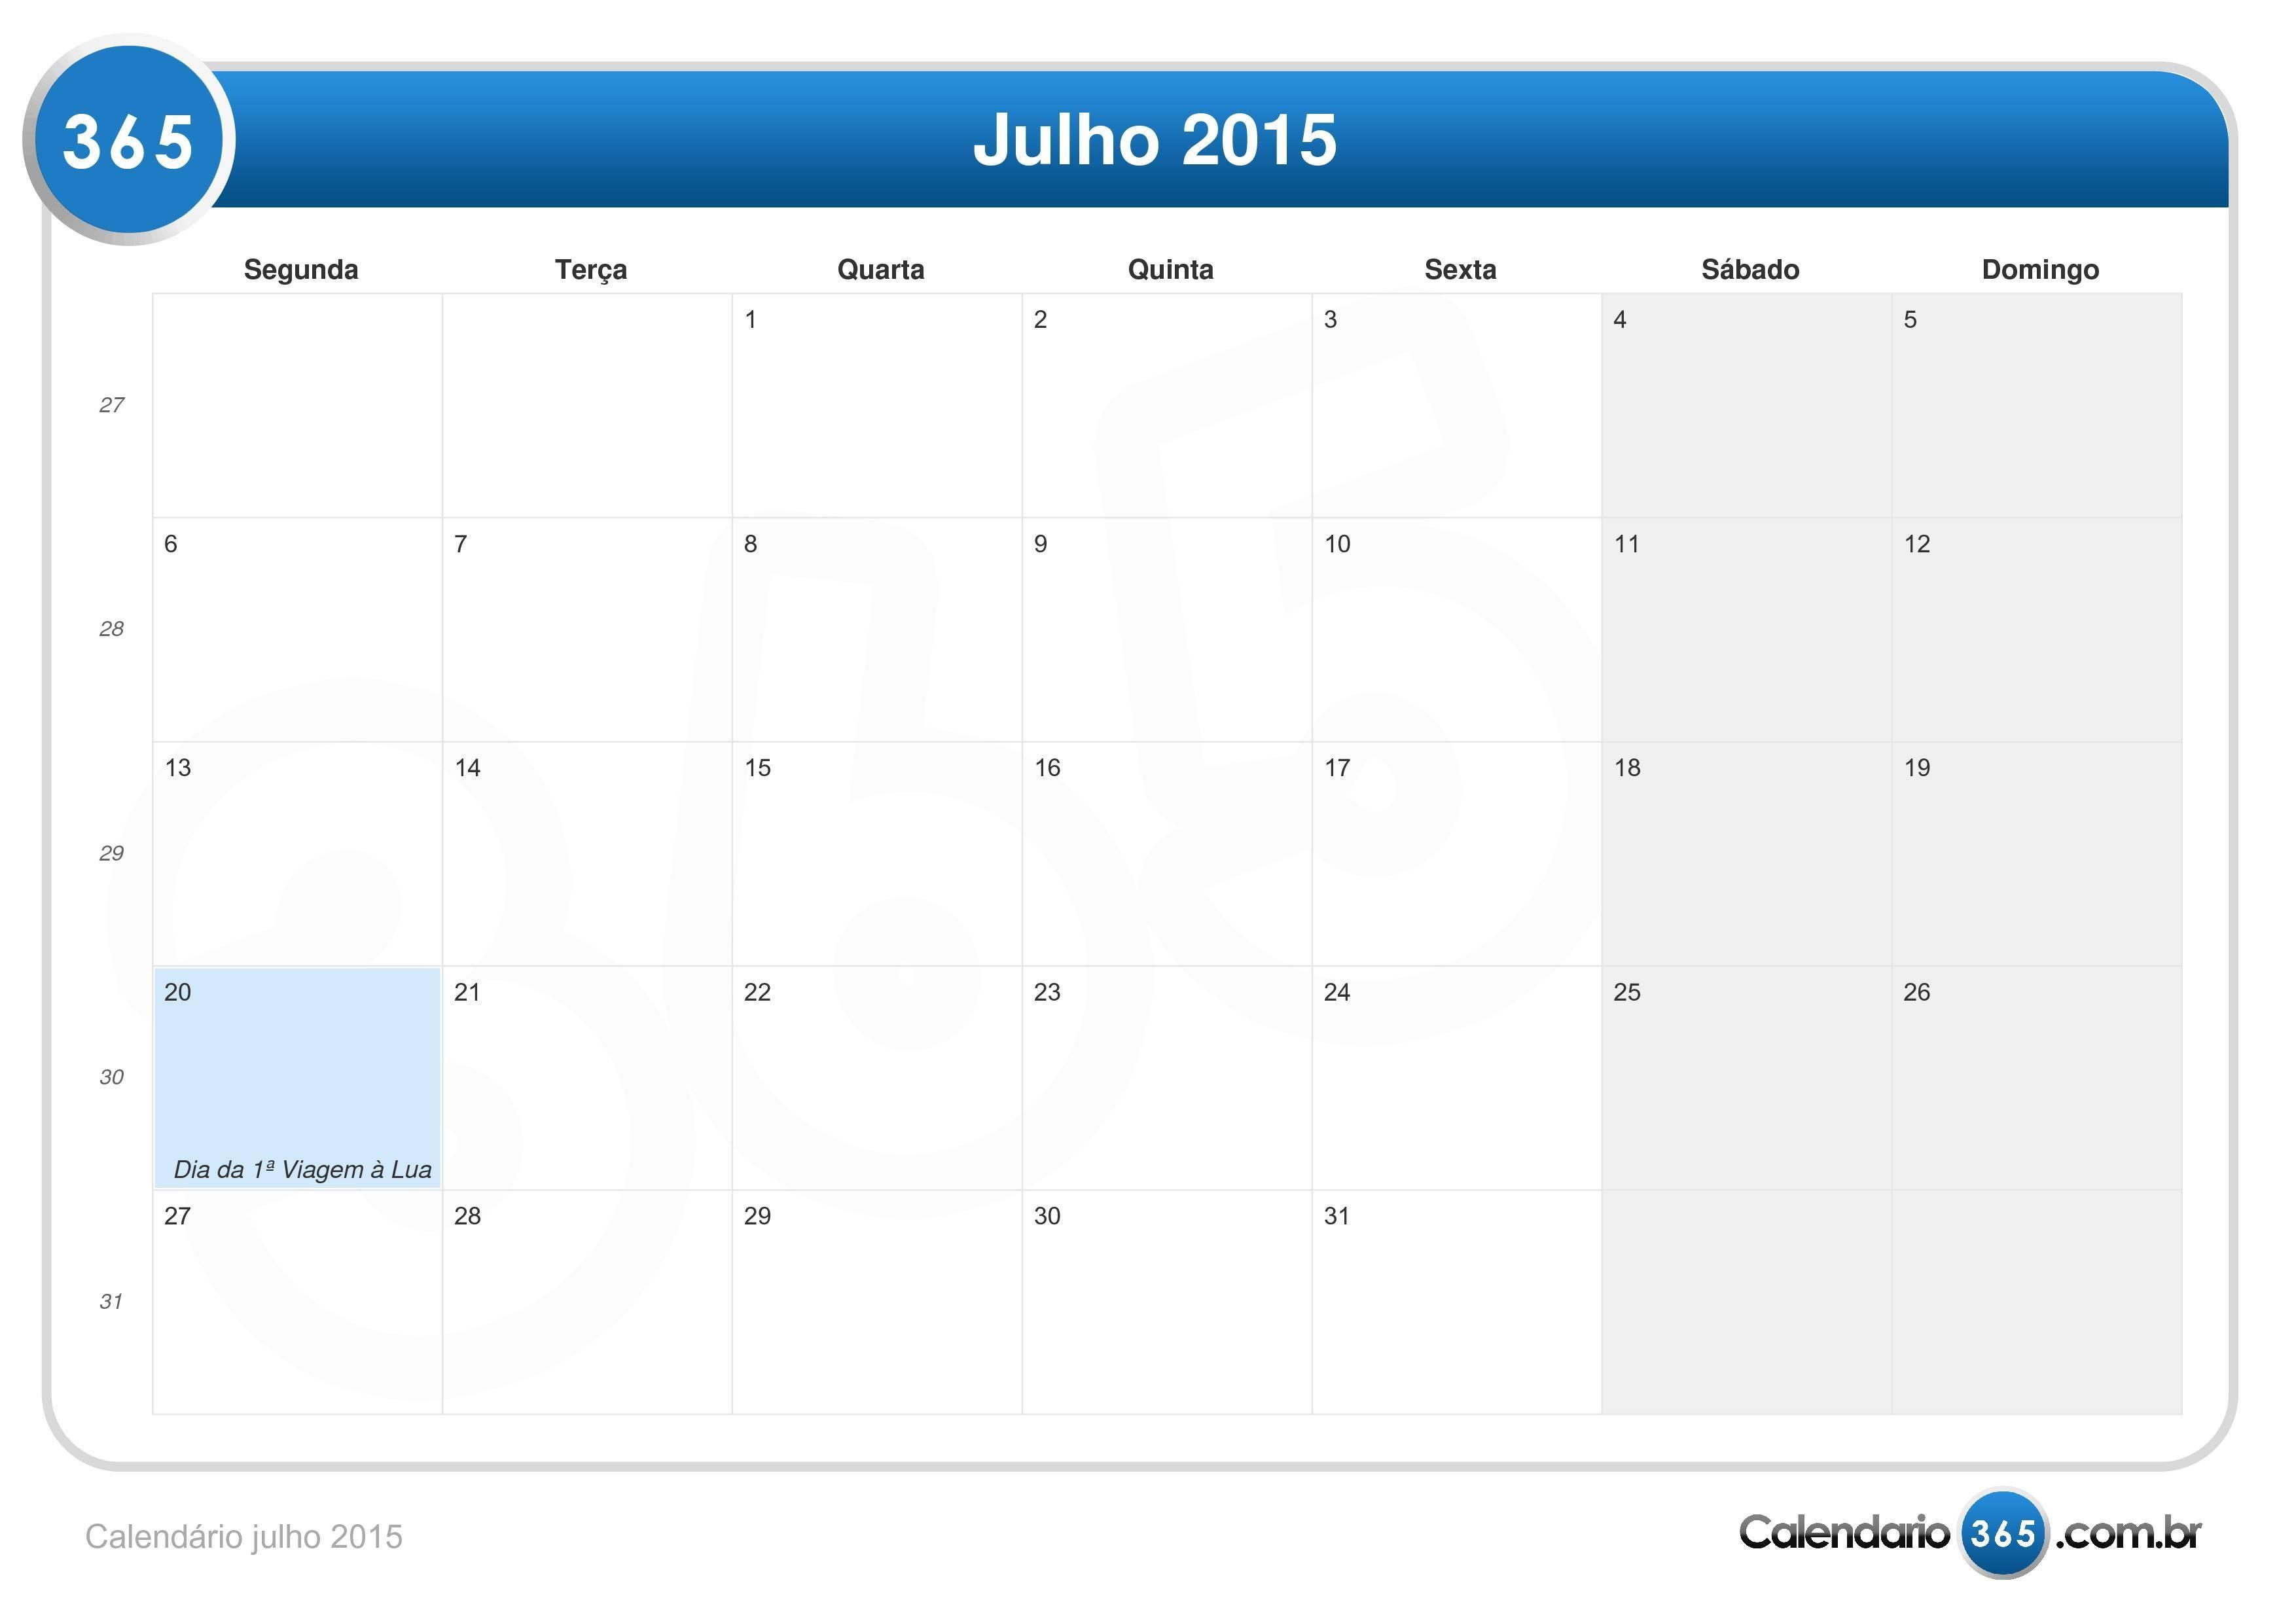 Calendario Agosto 2019 Imprimir Turma Da Monica Actual Notcias Ponto 06 29 15